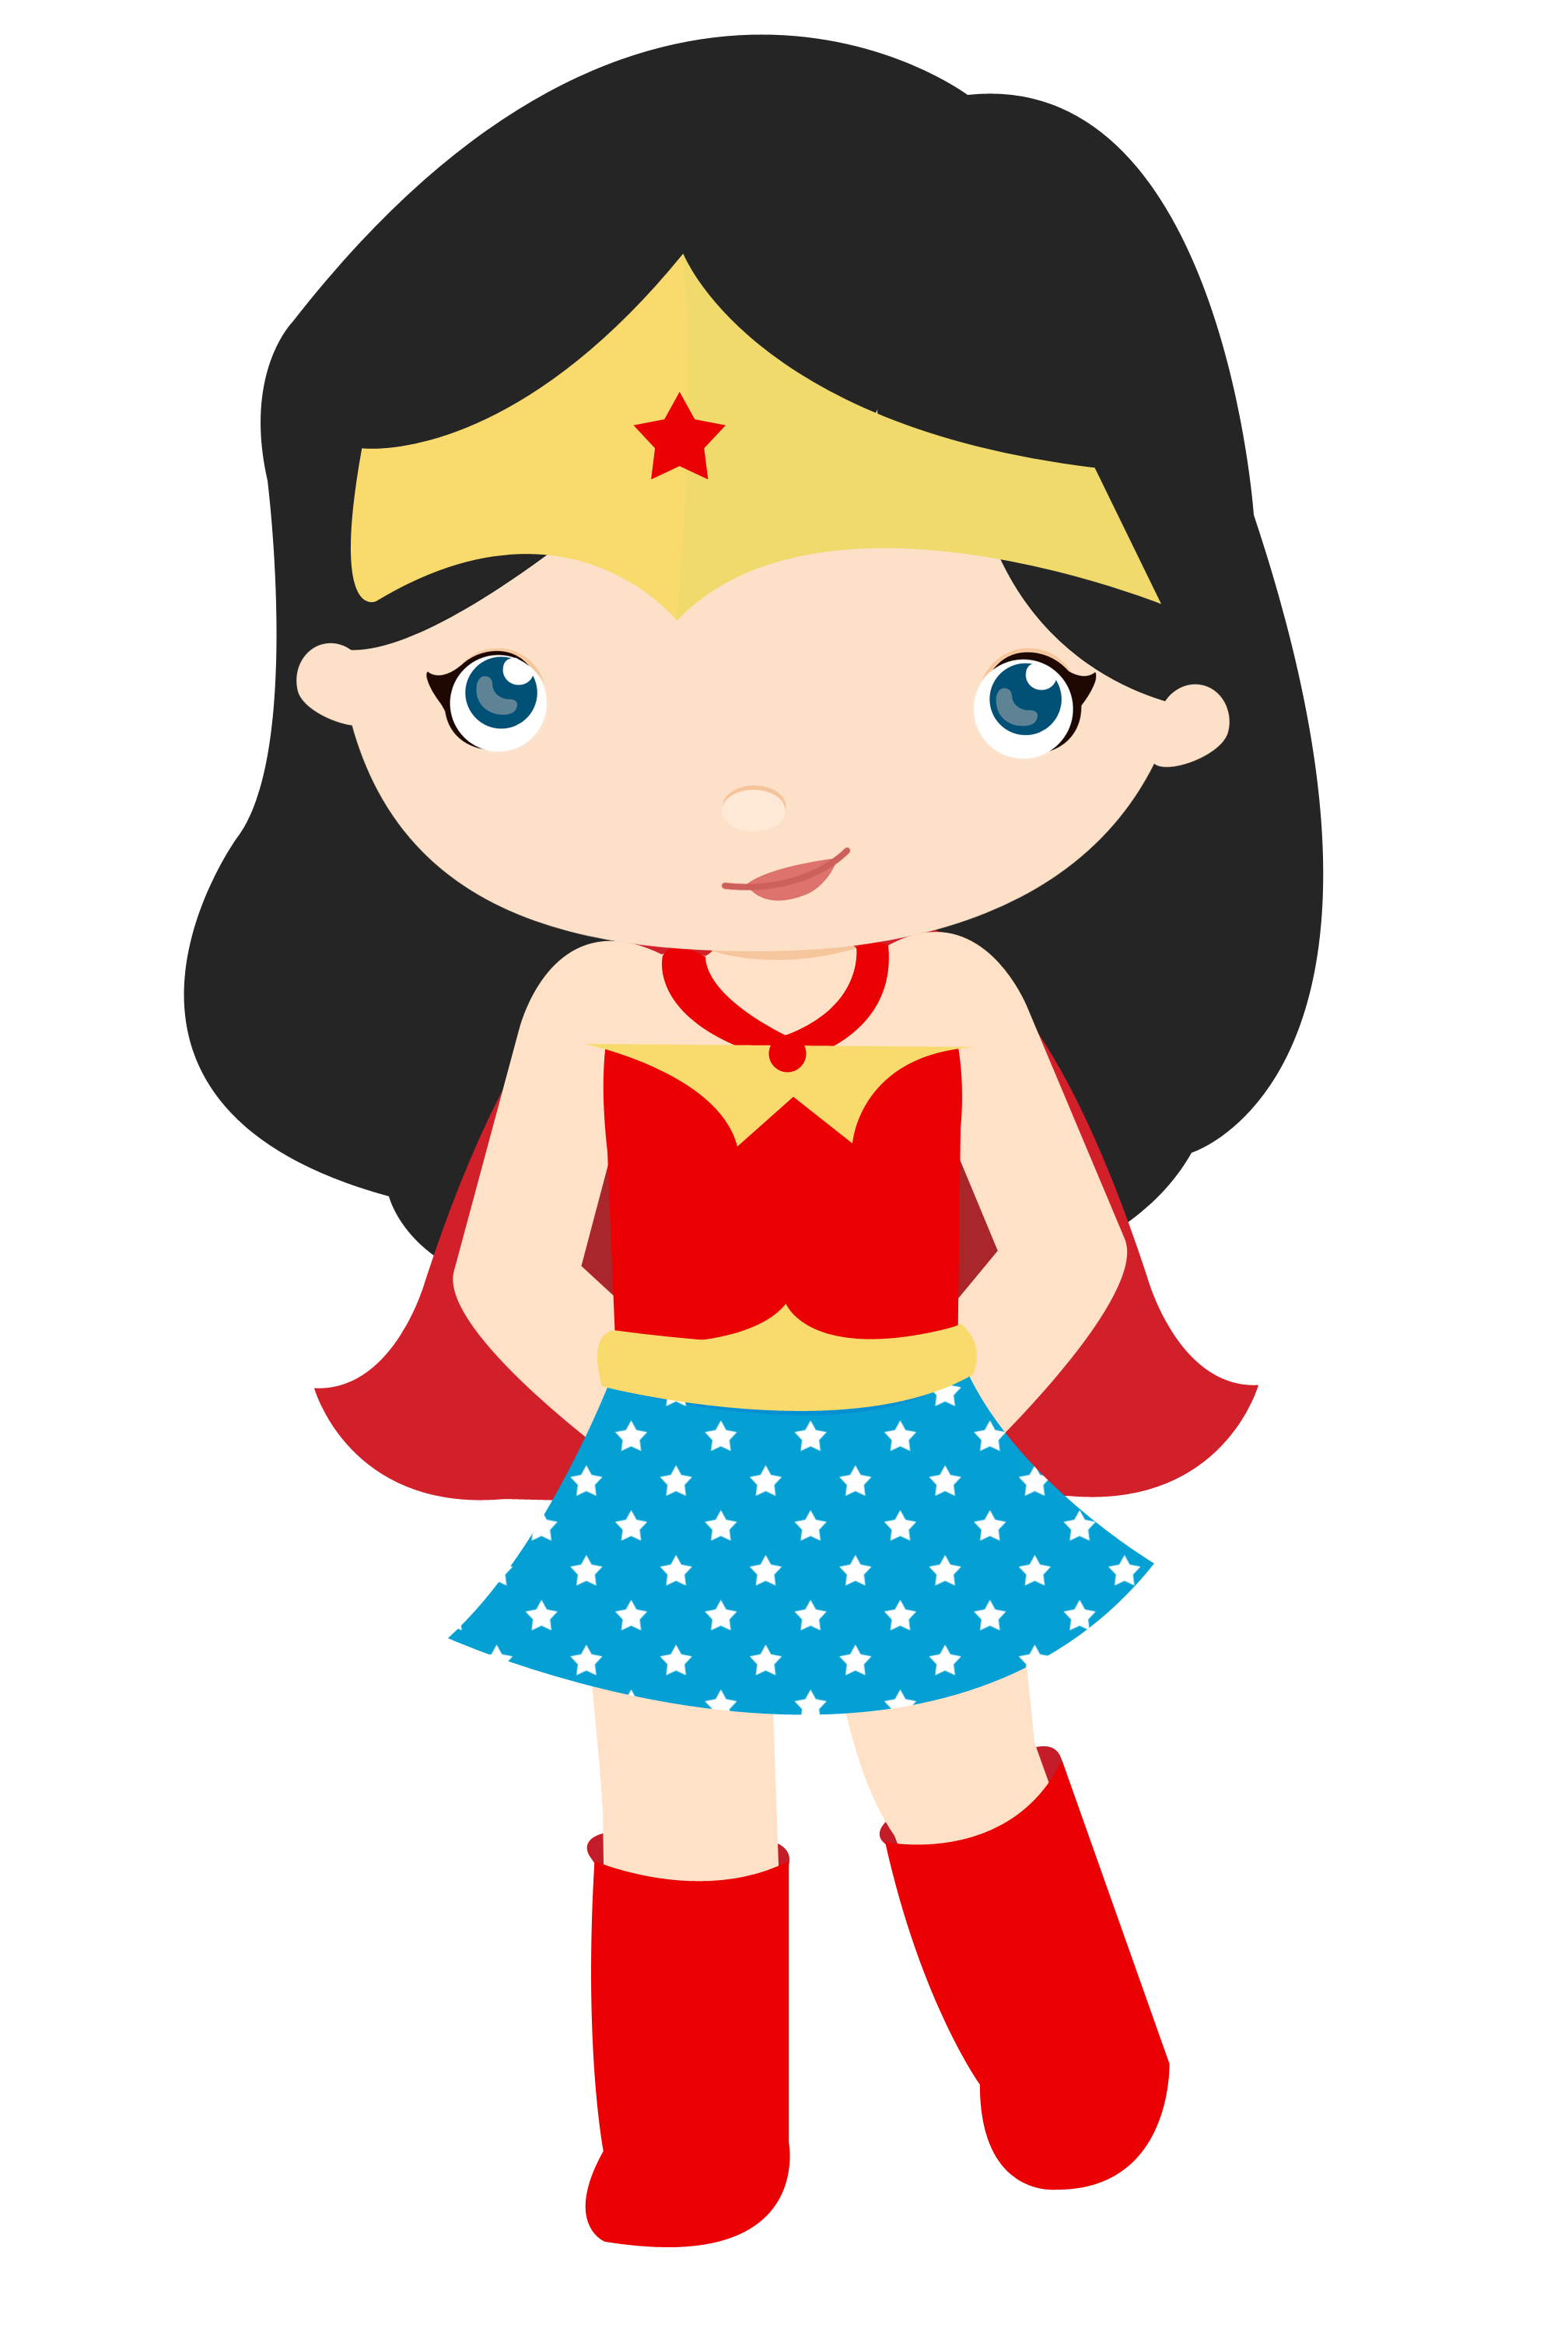 Cliparty mama picture transparent Aventuras de una super mama | heroes | Pinterest picture transparent